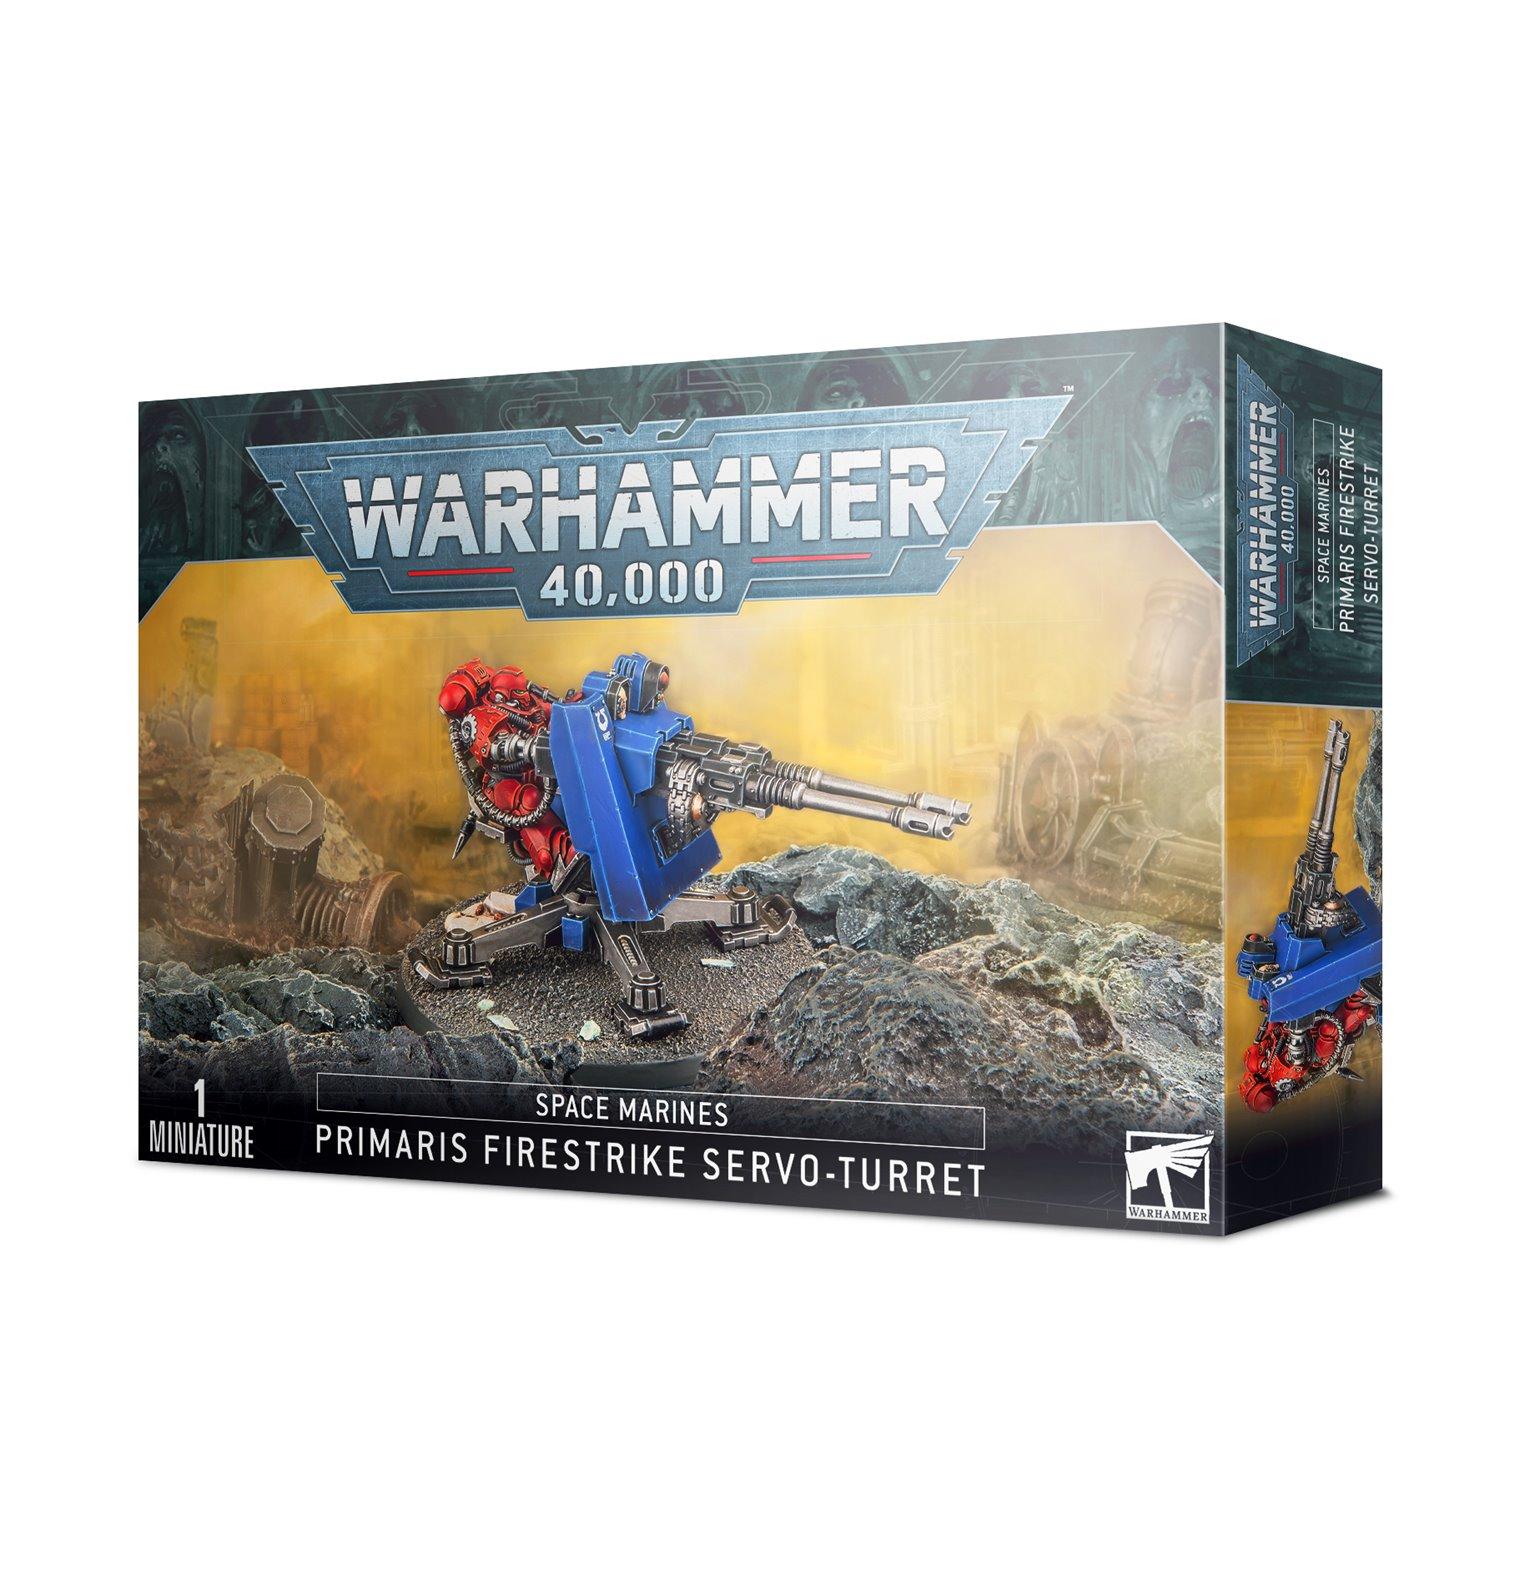 Warhammer 40,000 Space Marines Firestrike Servo-Turret